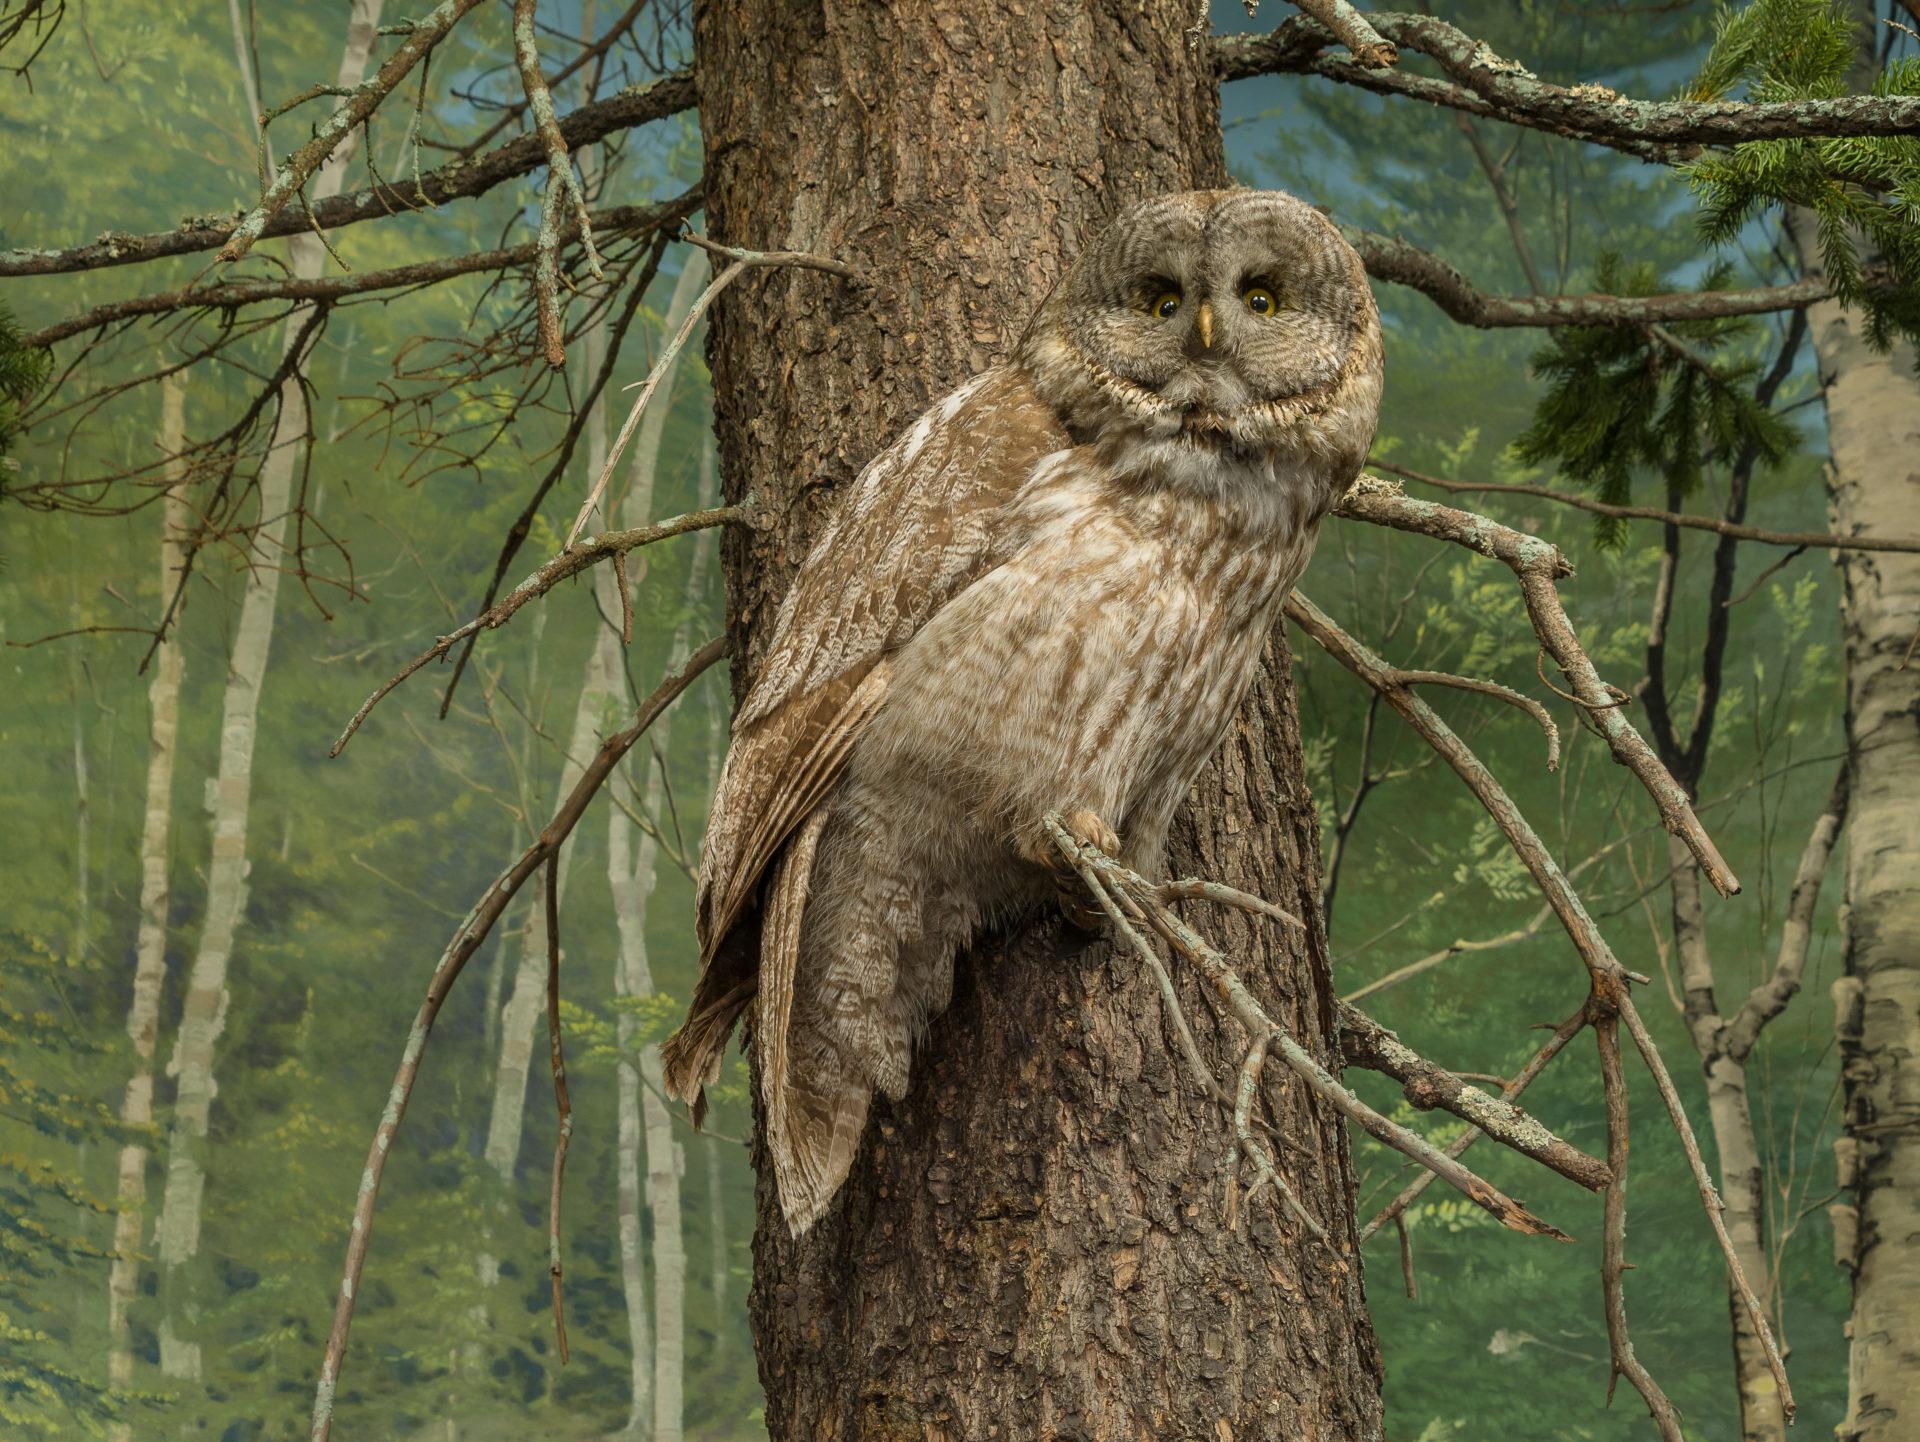 Great gray owl alert in a tree